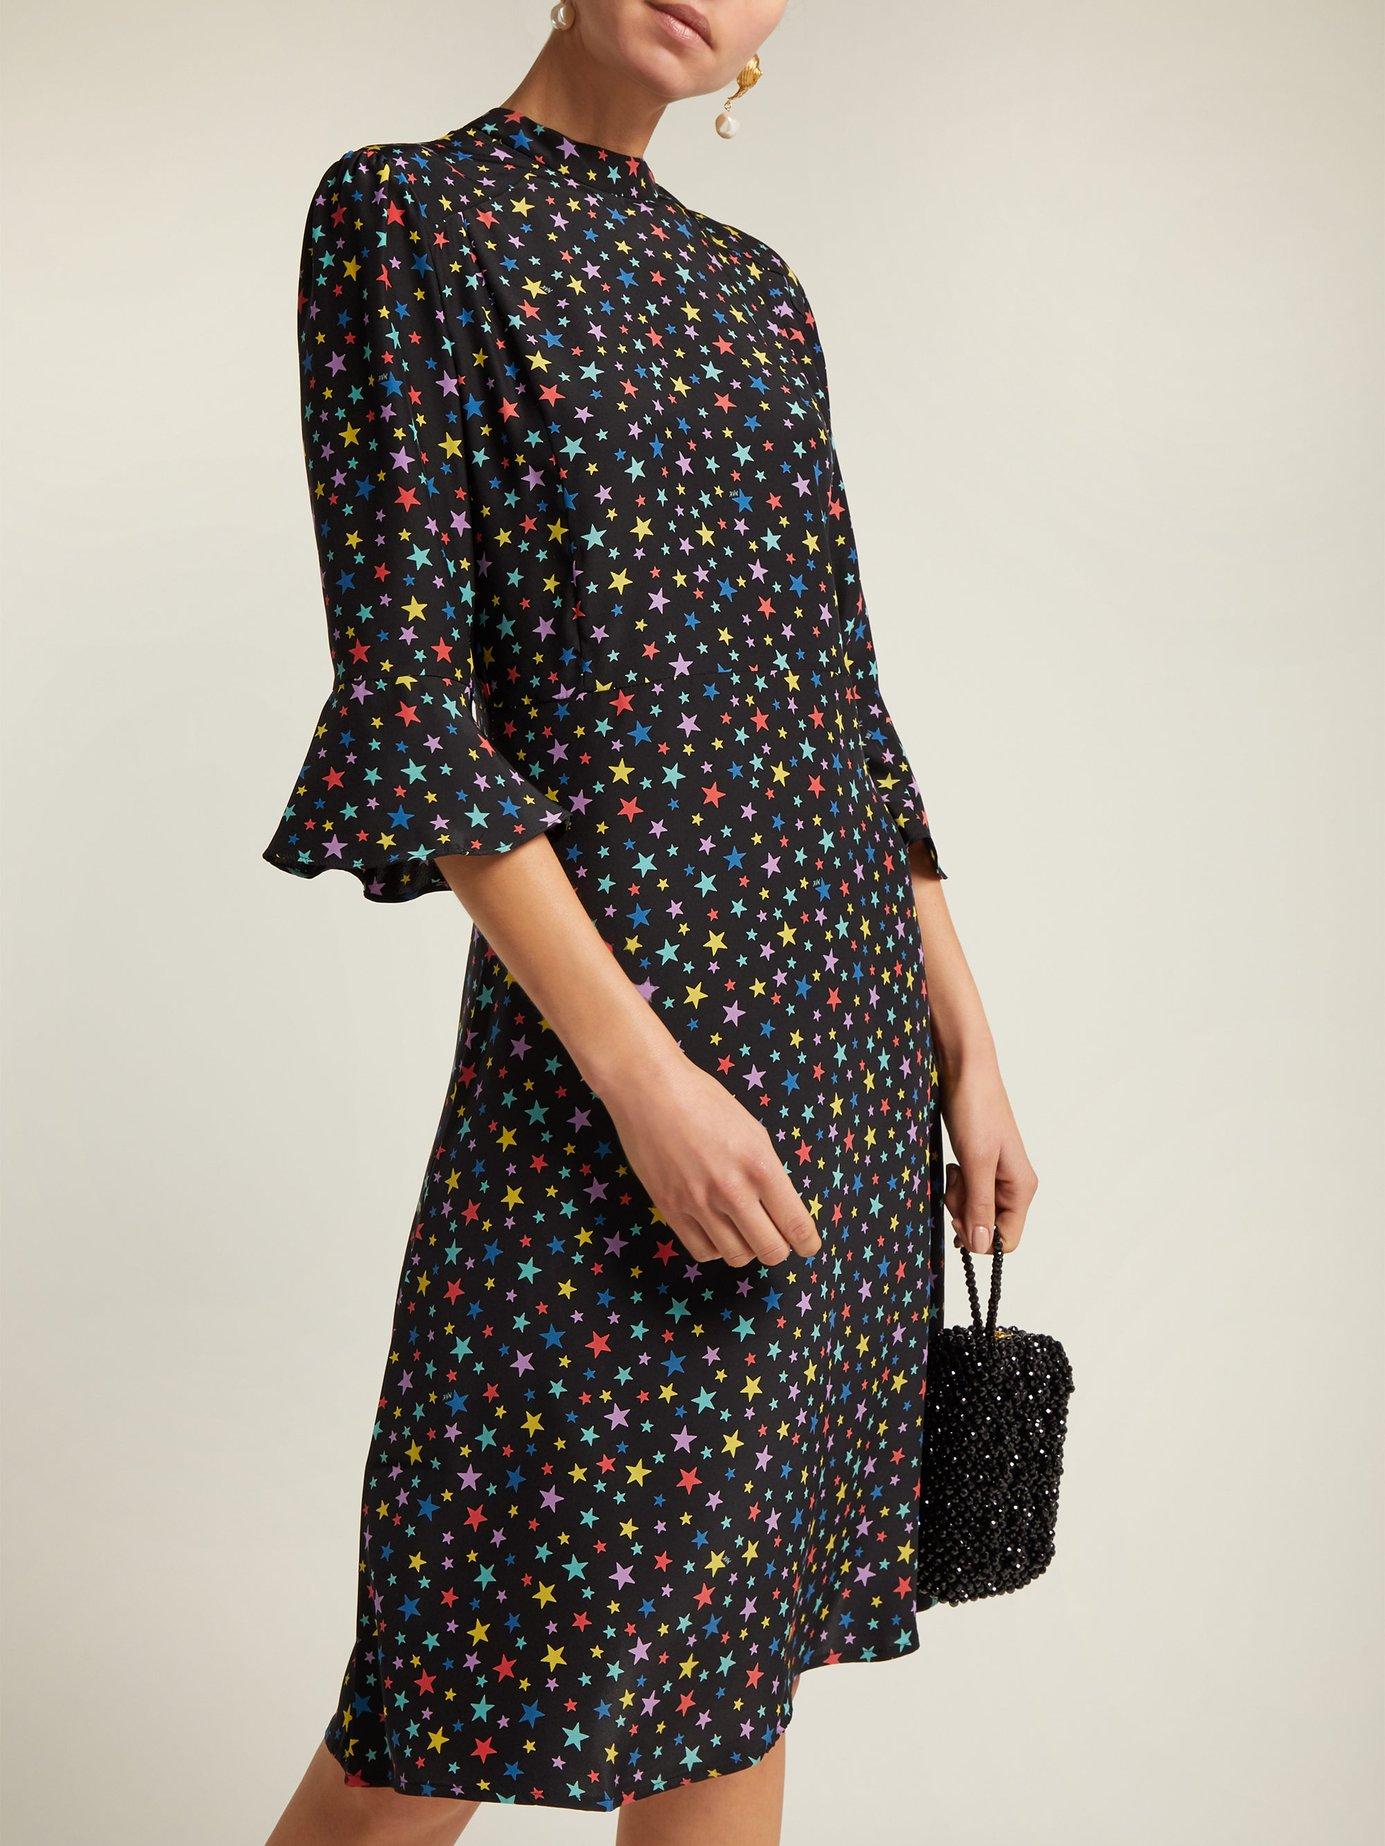 Ashley rainbow star-print silk dress by Hvn